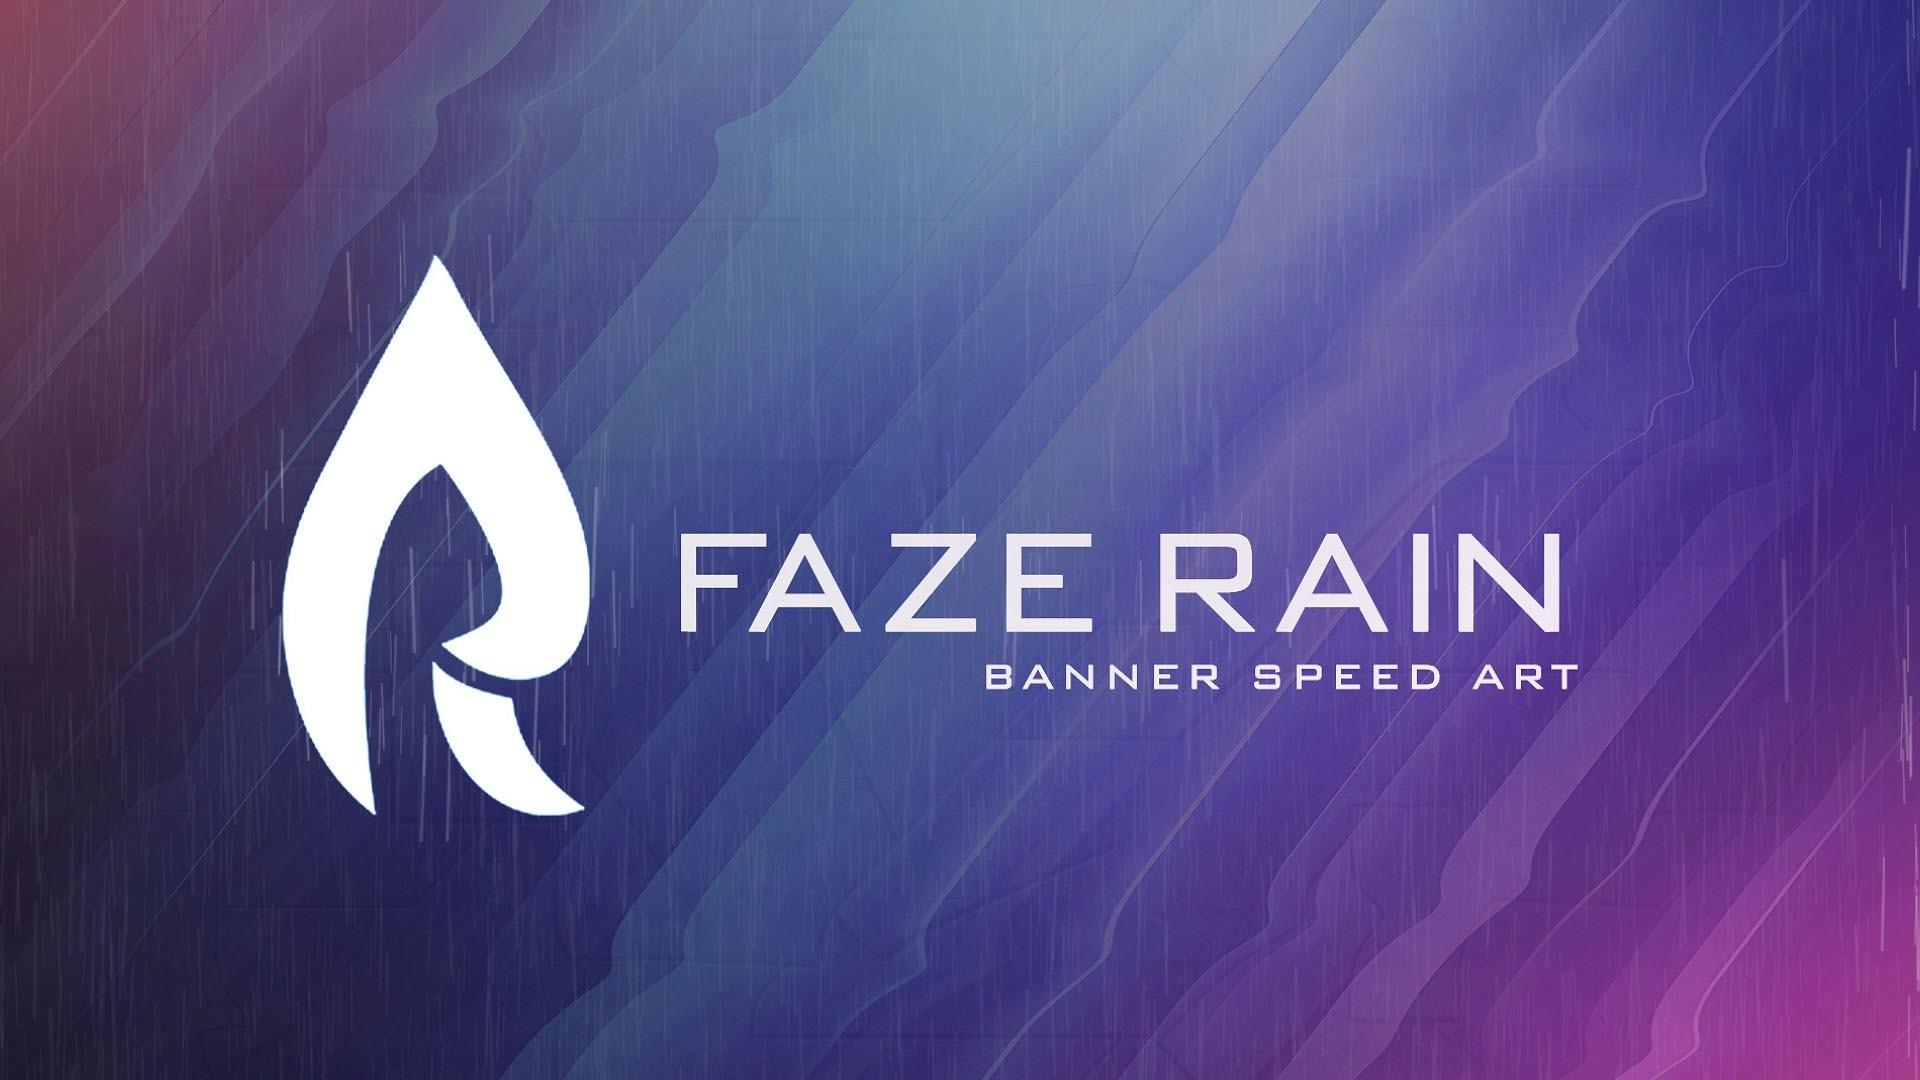 Res: 1920x1080, Faze Rain FaZe Rain Wallpaper, Mobile Compatible FaZe Rain Wallpapers, FaZe  Rain .